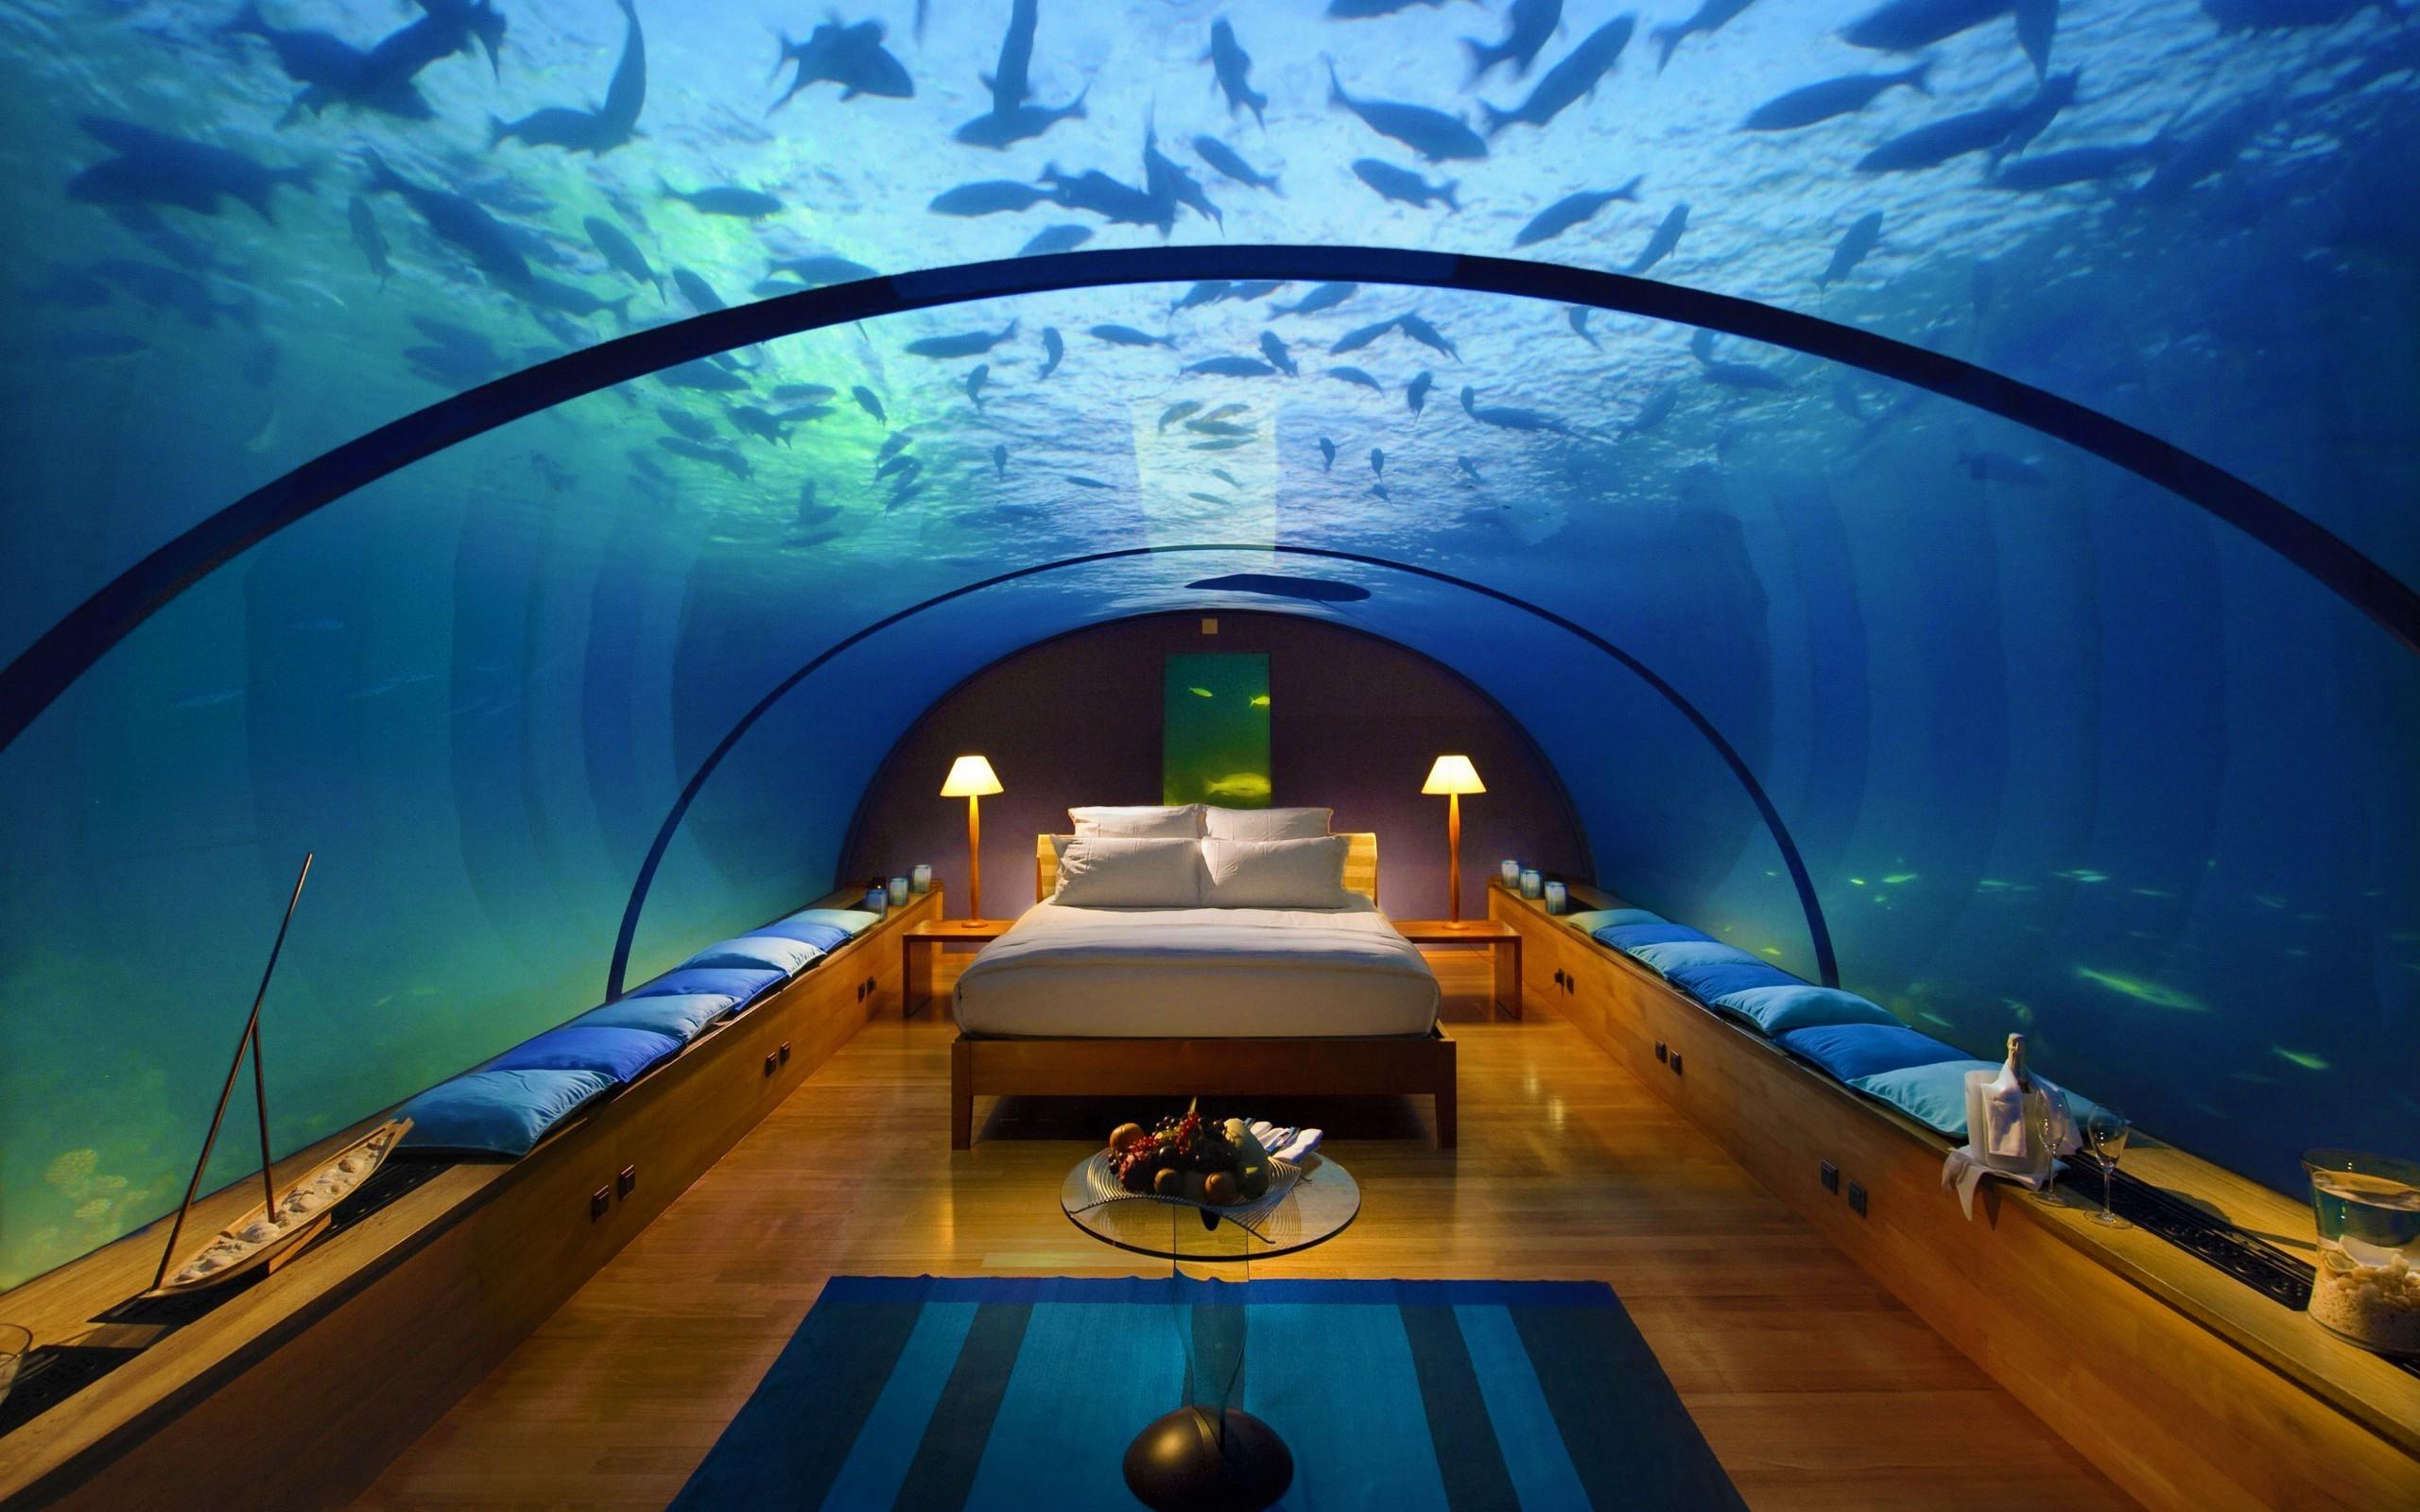 Fond d 39 cran int rieur lit un h tel piscine sous marin chambre aquarium capture d 39 cran for Hotel avec piscine dans la chambre